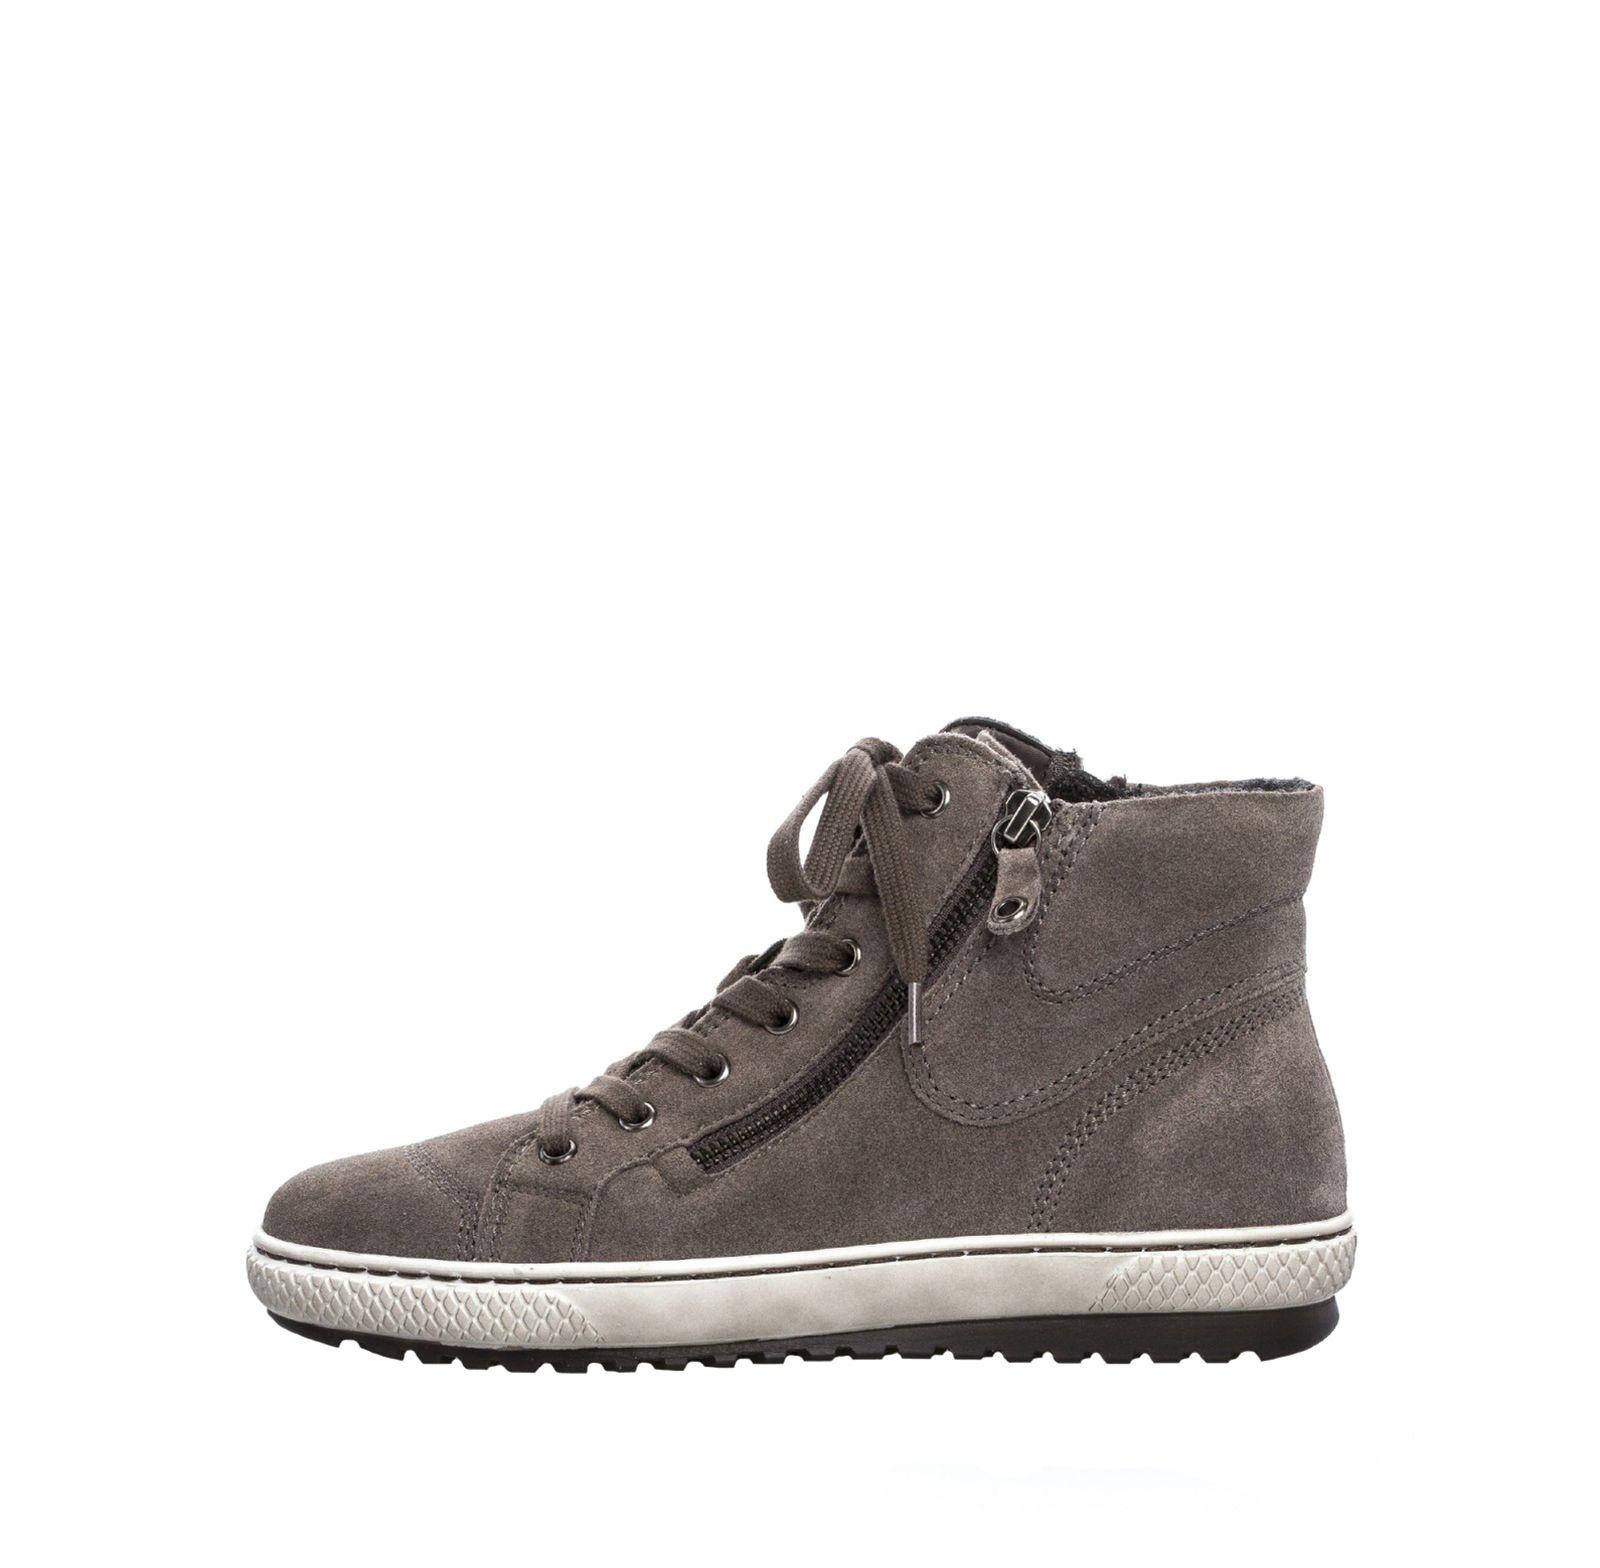 a013fa3852f161 Gabor Damen Sneaker Mid 73.754.13 wallaby beige